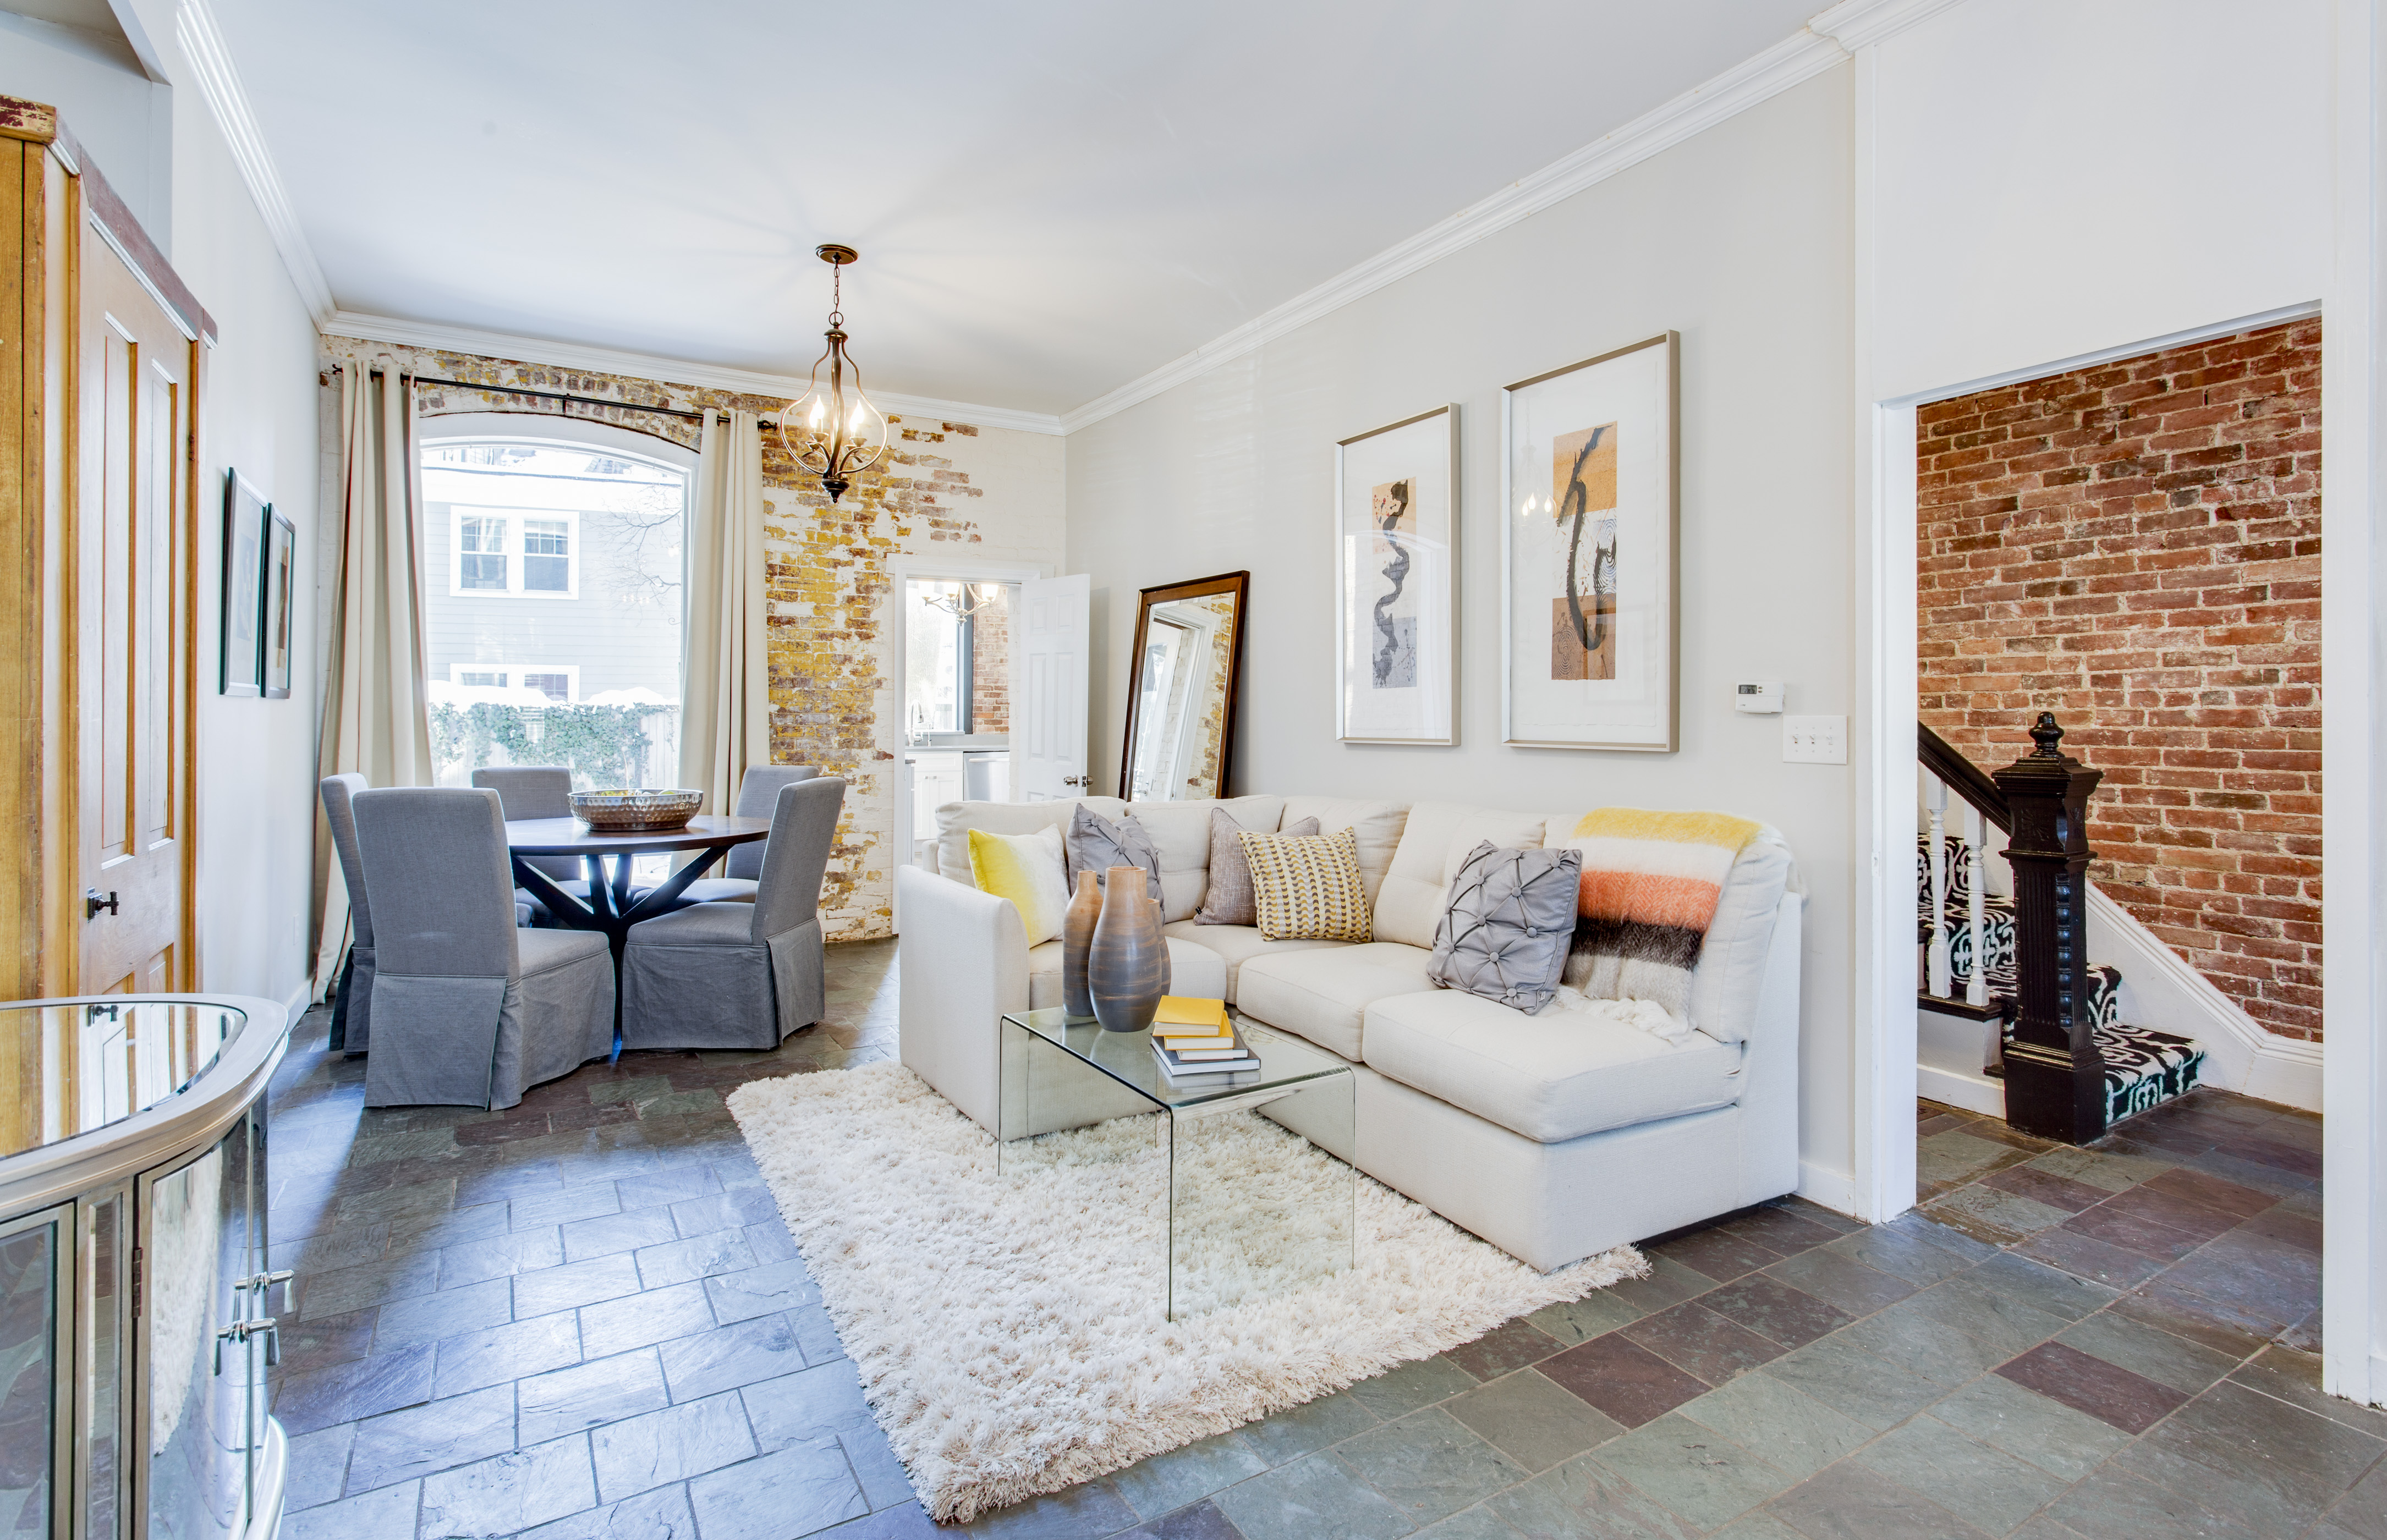 Villa per Vendita alle ore 52 Kirkland Street Singe-Family Home in Harvard Square Cambridge, Massachusetts, 02138 Stati Uniti